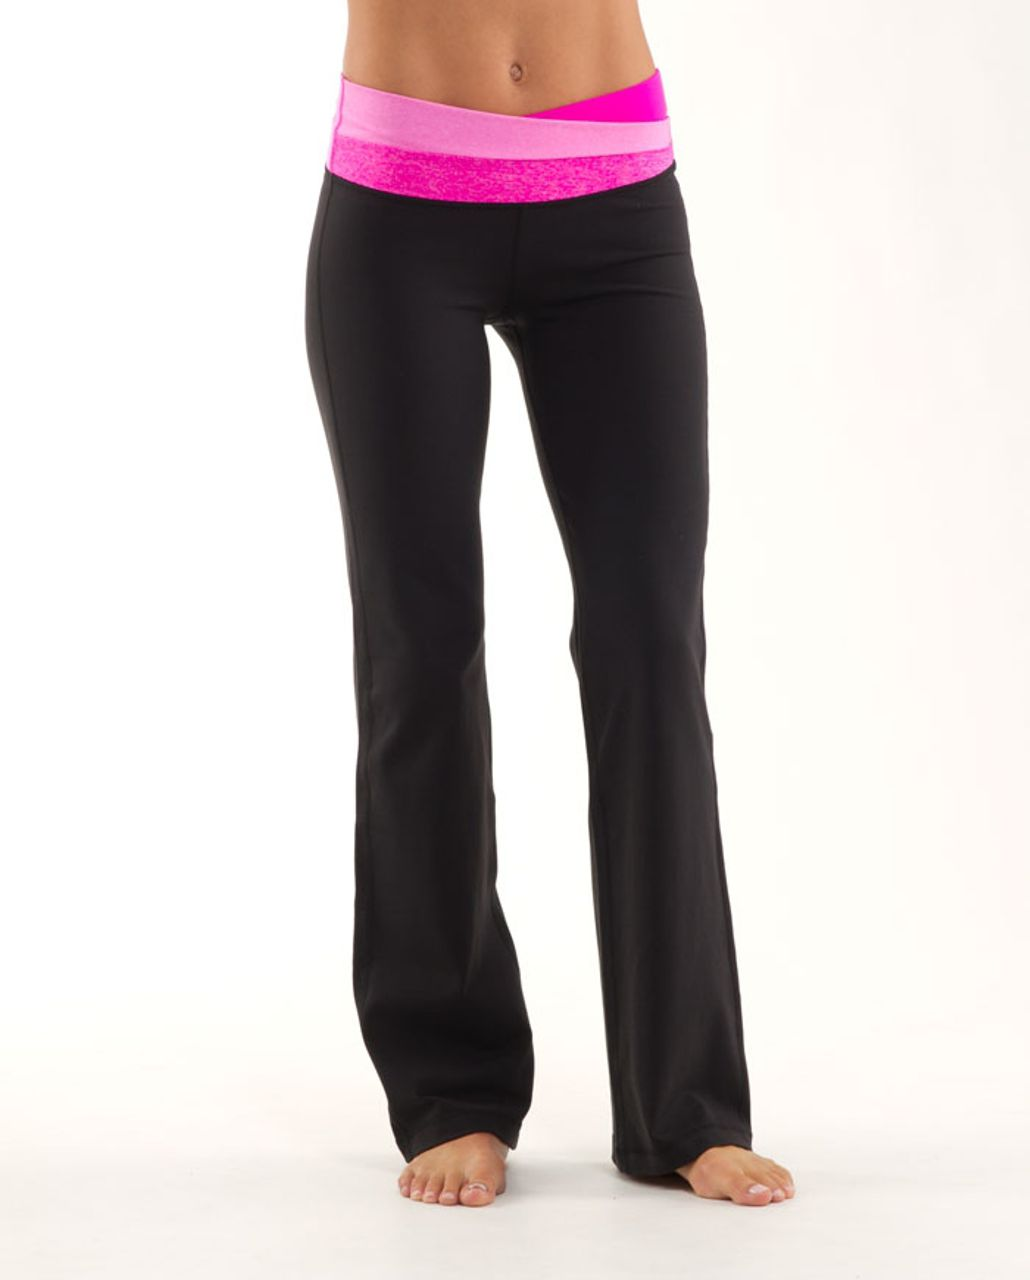 Lululemon Astro Pant (Tall) - Black /  Paris Pink /  Paris Pink White Microstripe